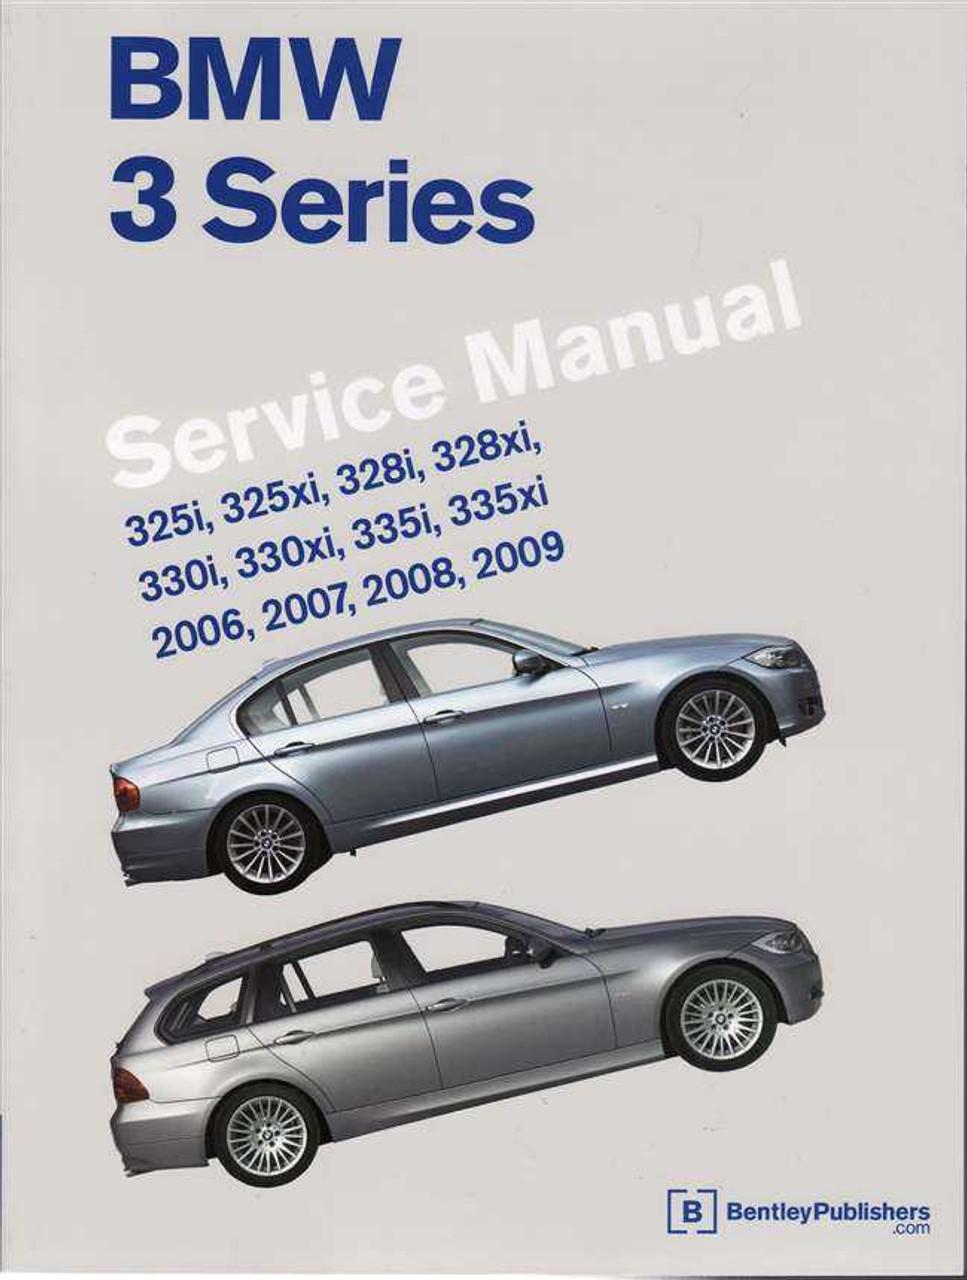 330i workshop manual various owner manual guide u2022 rh justk co bmw 3 series e46 workshop manual free download bmw 3 series e46 workshop manual free download